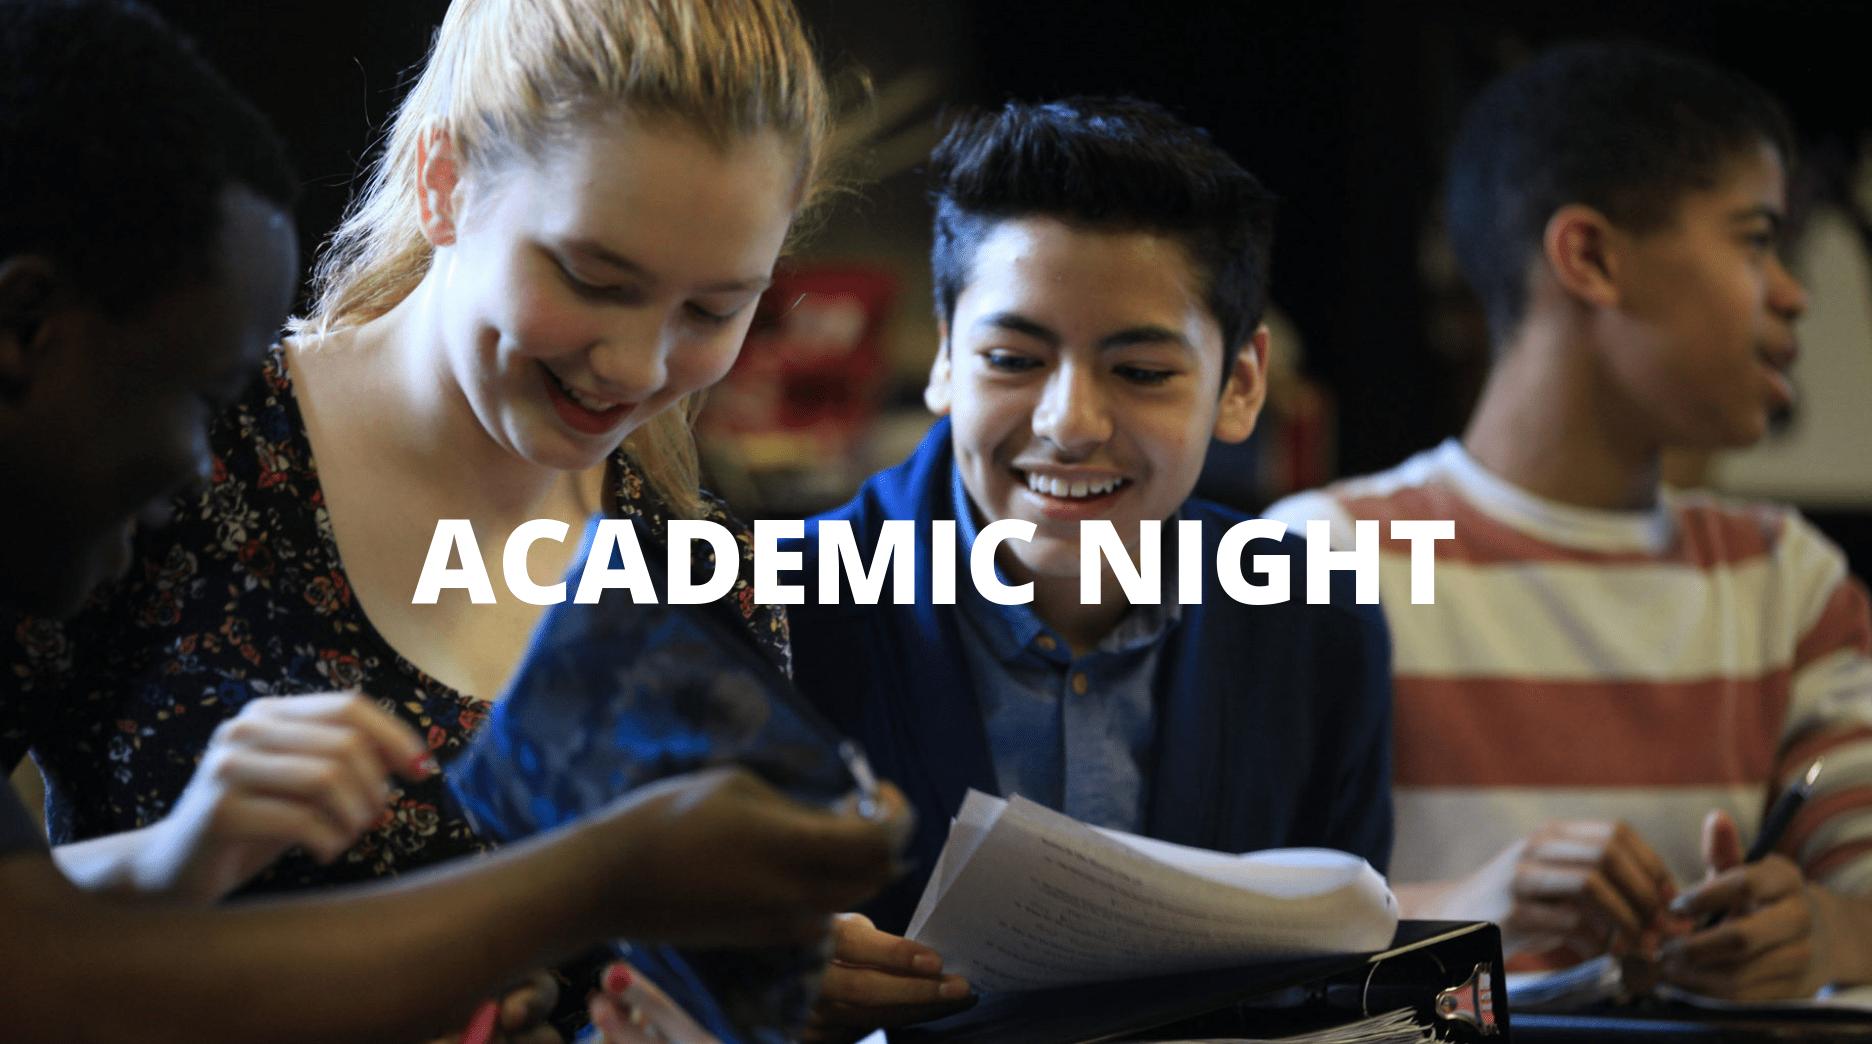 Academic Night FB 2019 - 2.png